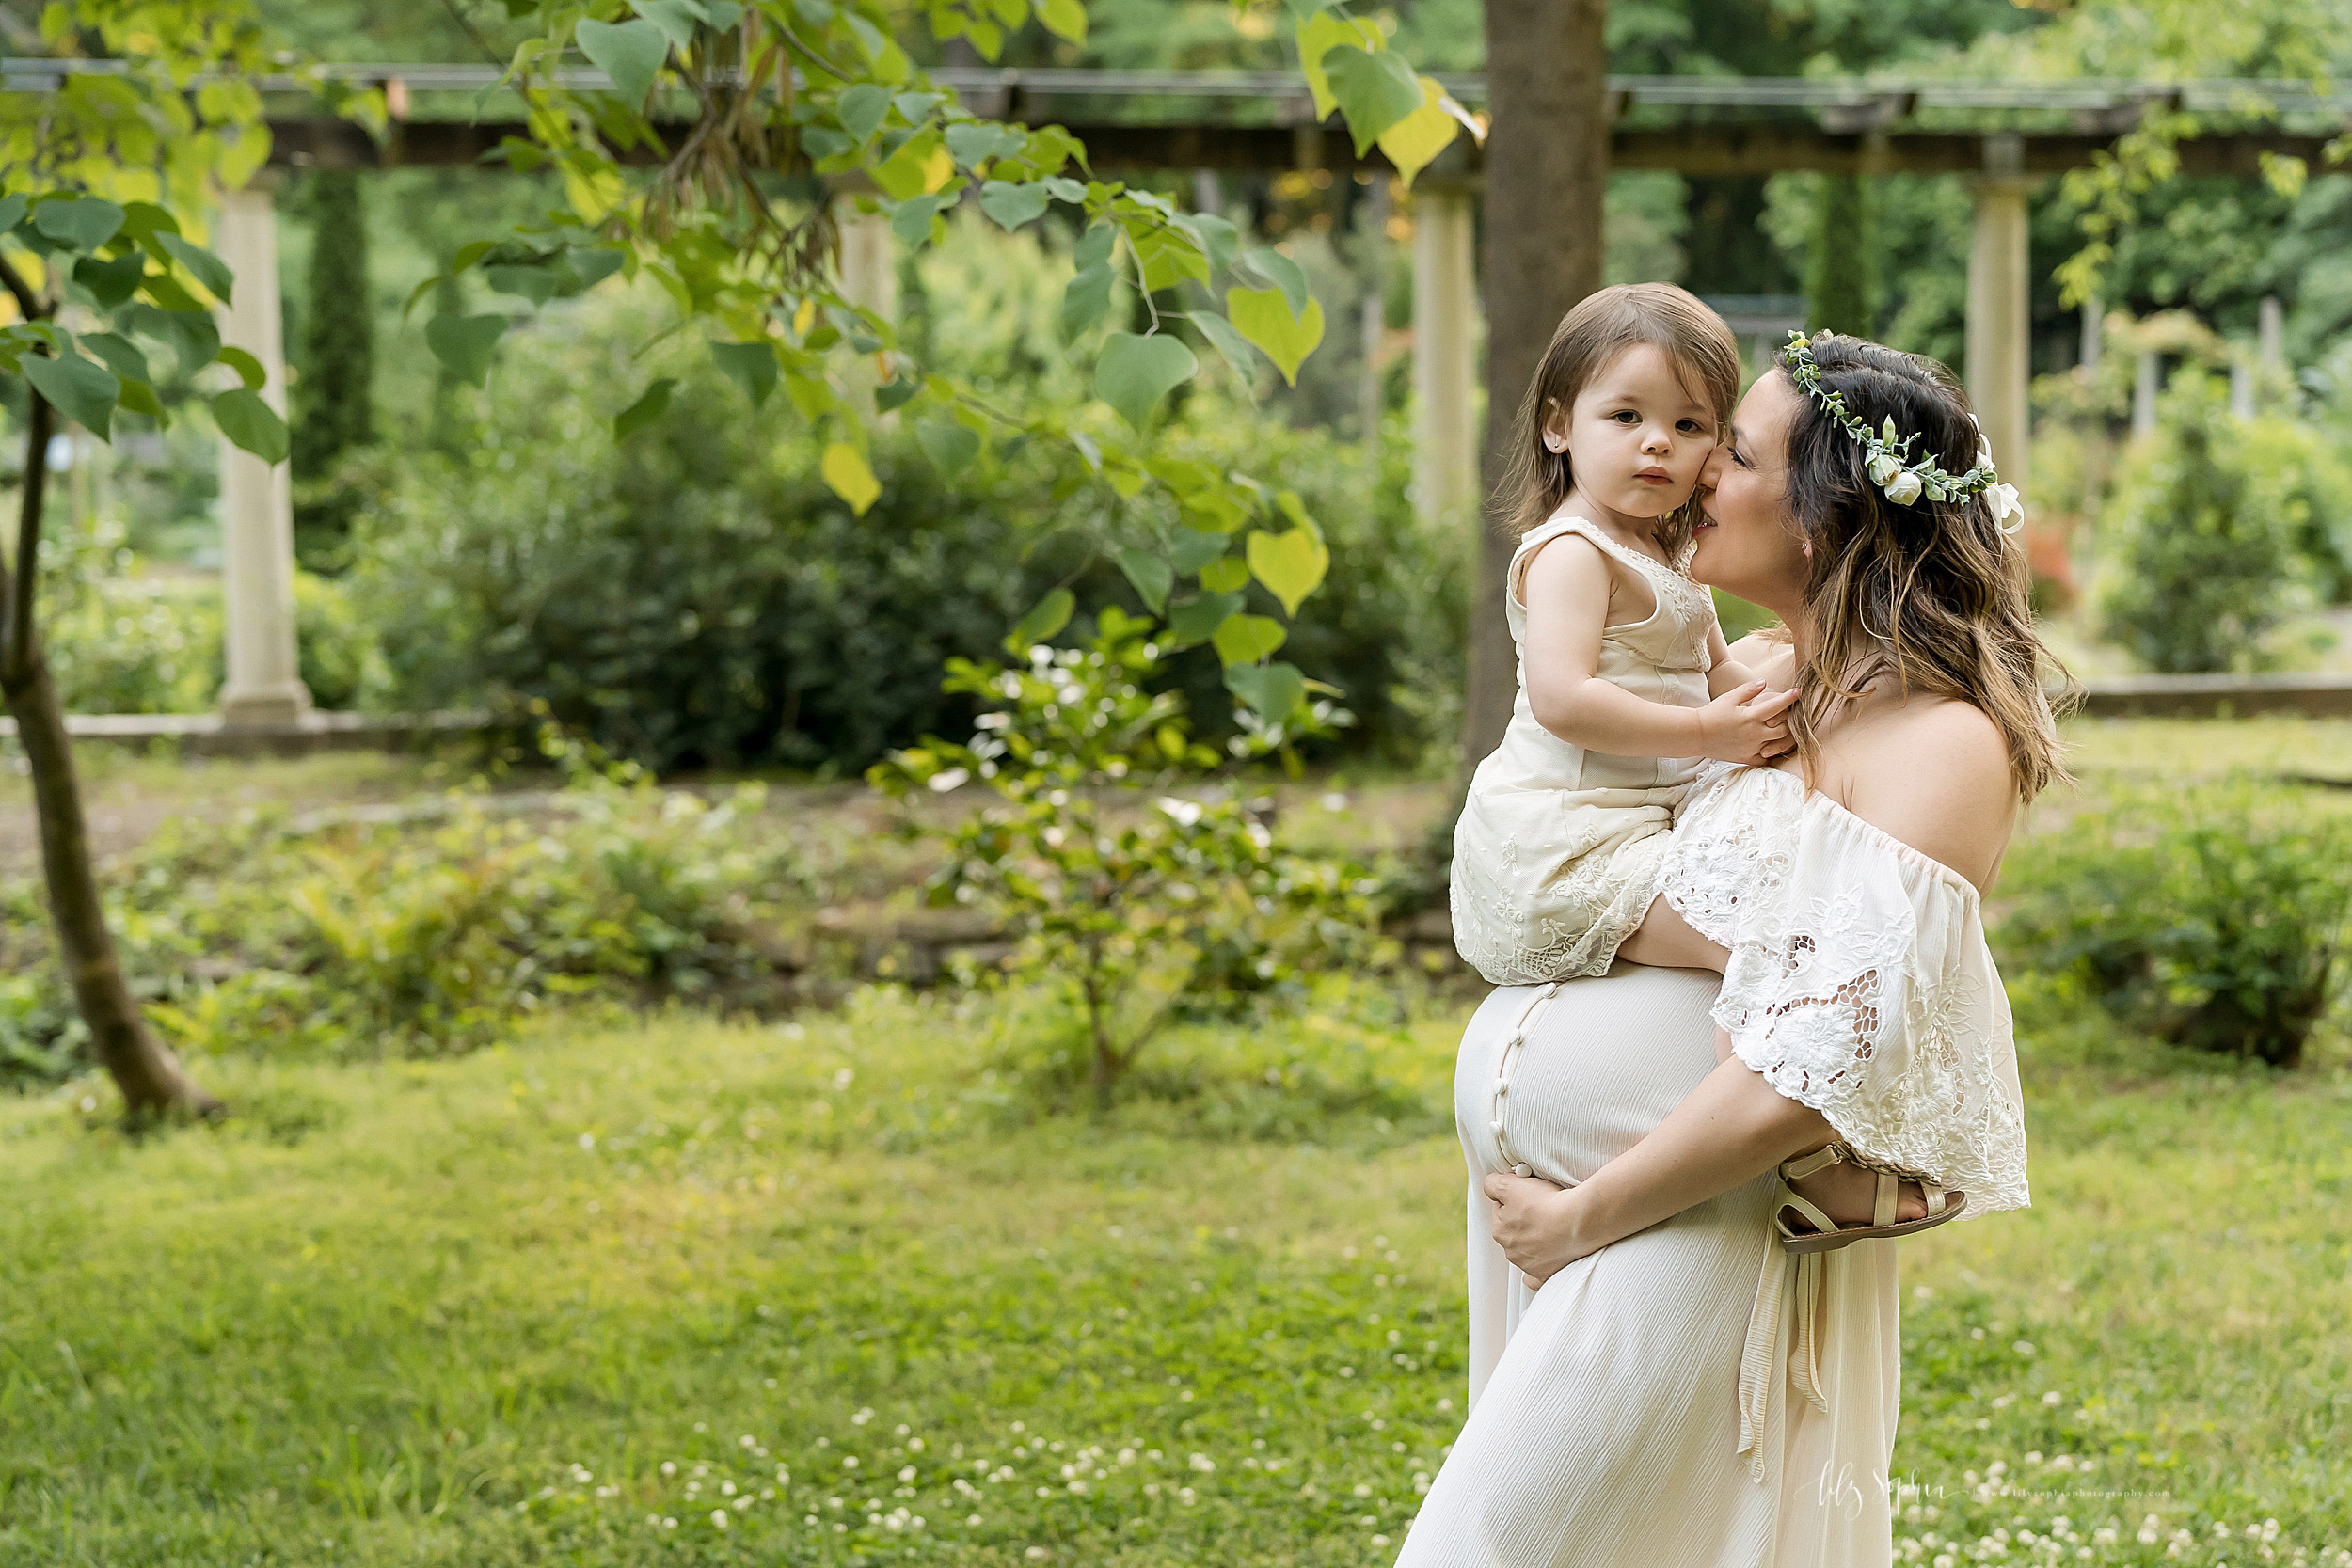 atlanta-decatur-acworth-candler-park-sandy-springs-buckhead-virginia-highlands-west-end-decatur-lily-sophia-photography-gardens-maternity-couples-family-photos-toddler-girl-expecting-newborn-baby-girl-sister_1697.jpg